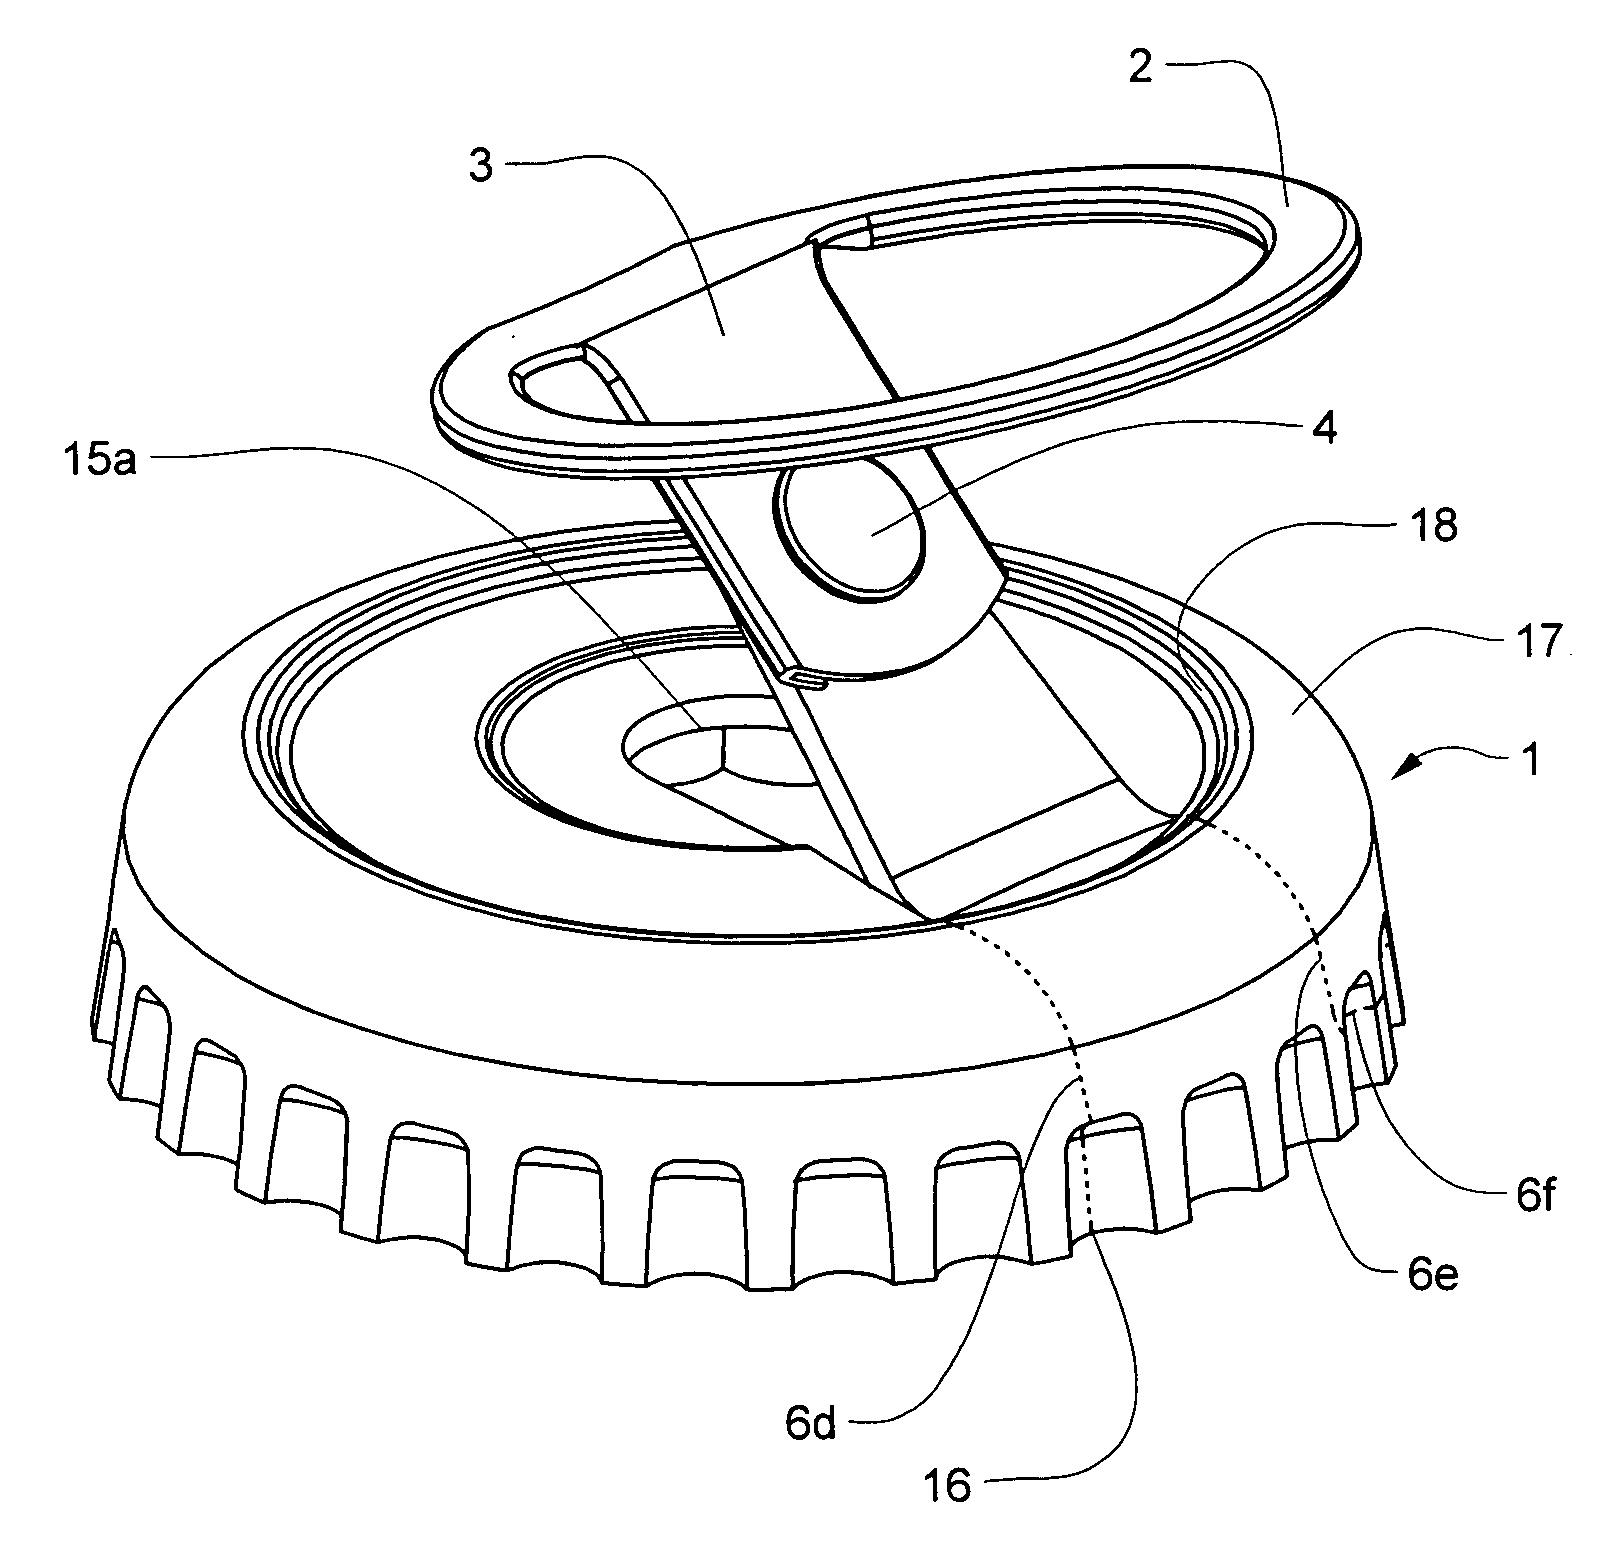 patent us20070181526 easy pull bottle cap google patents. Black Bedroom Furniture Sets. Home Design Ideas